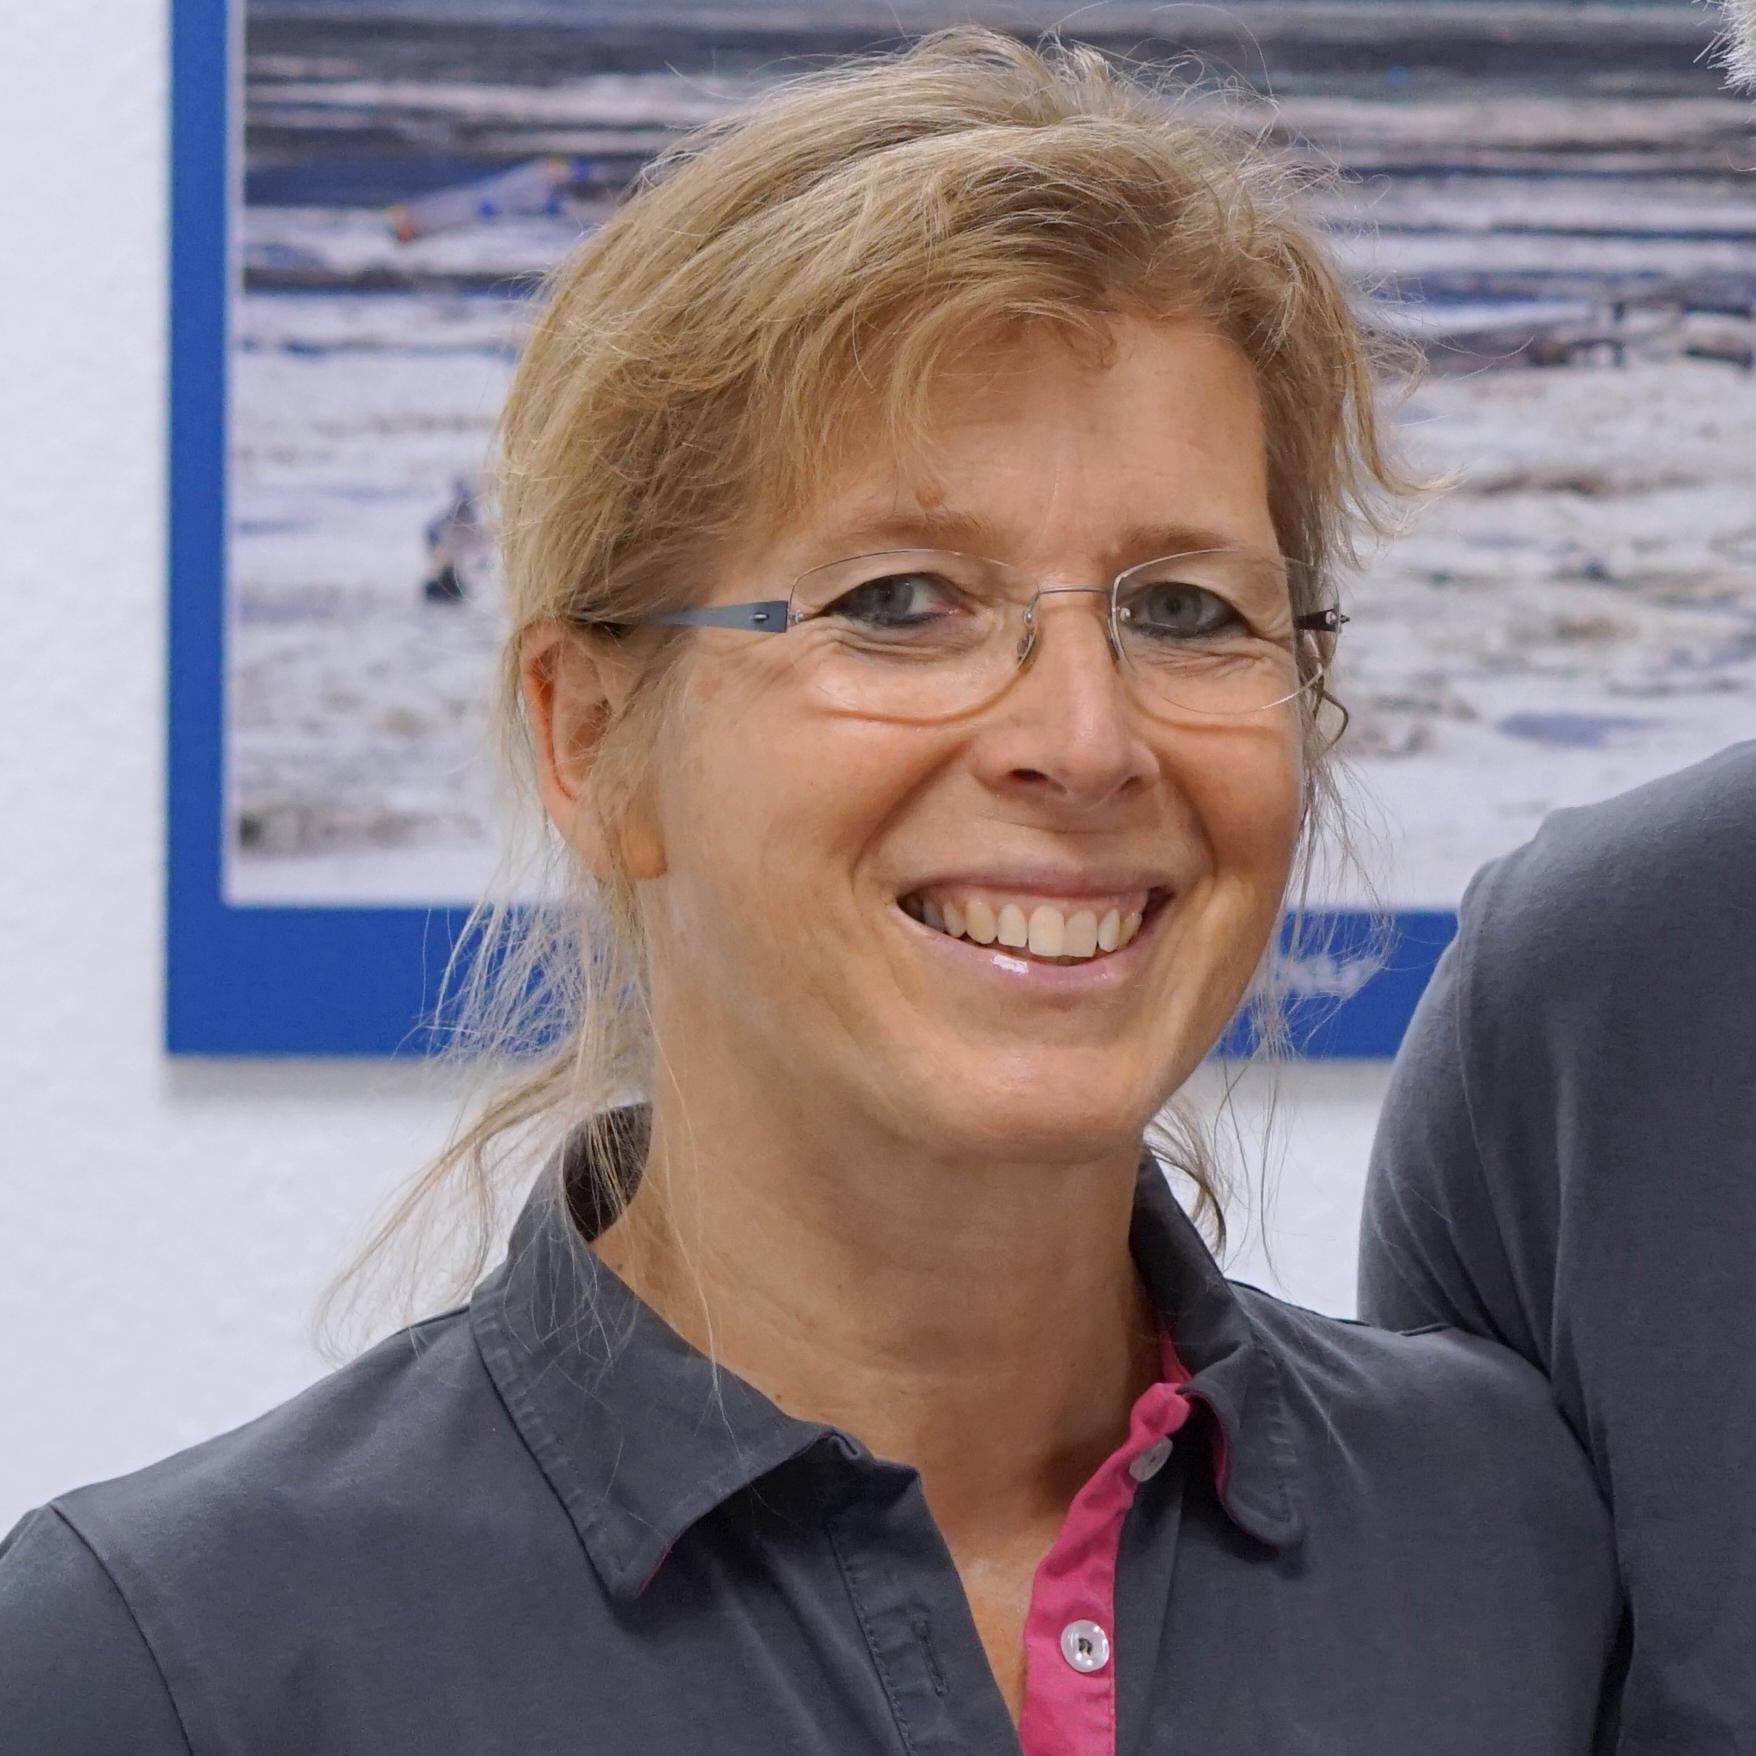 Frau Schadwinkel_1x1